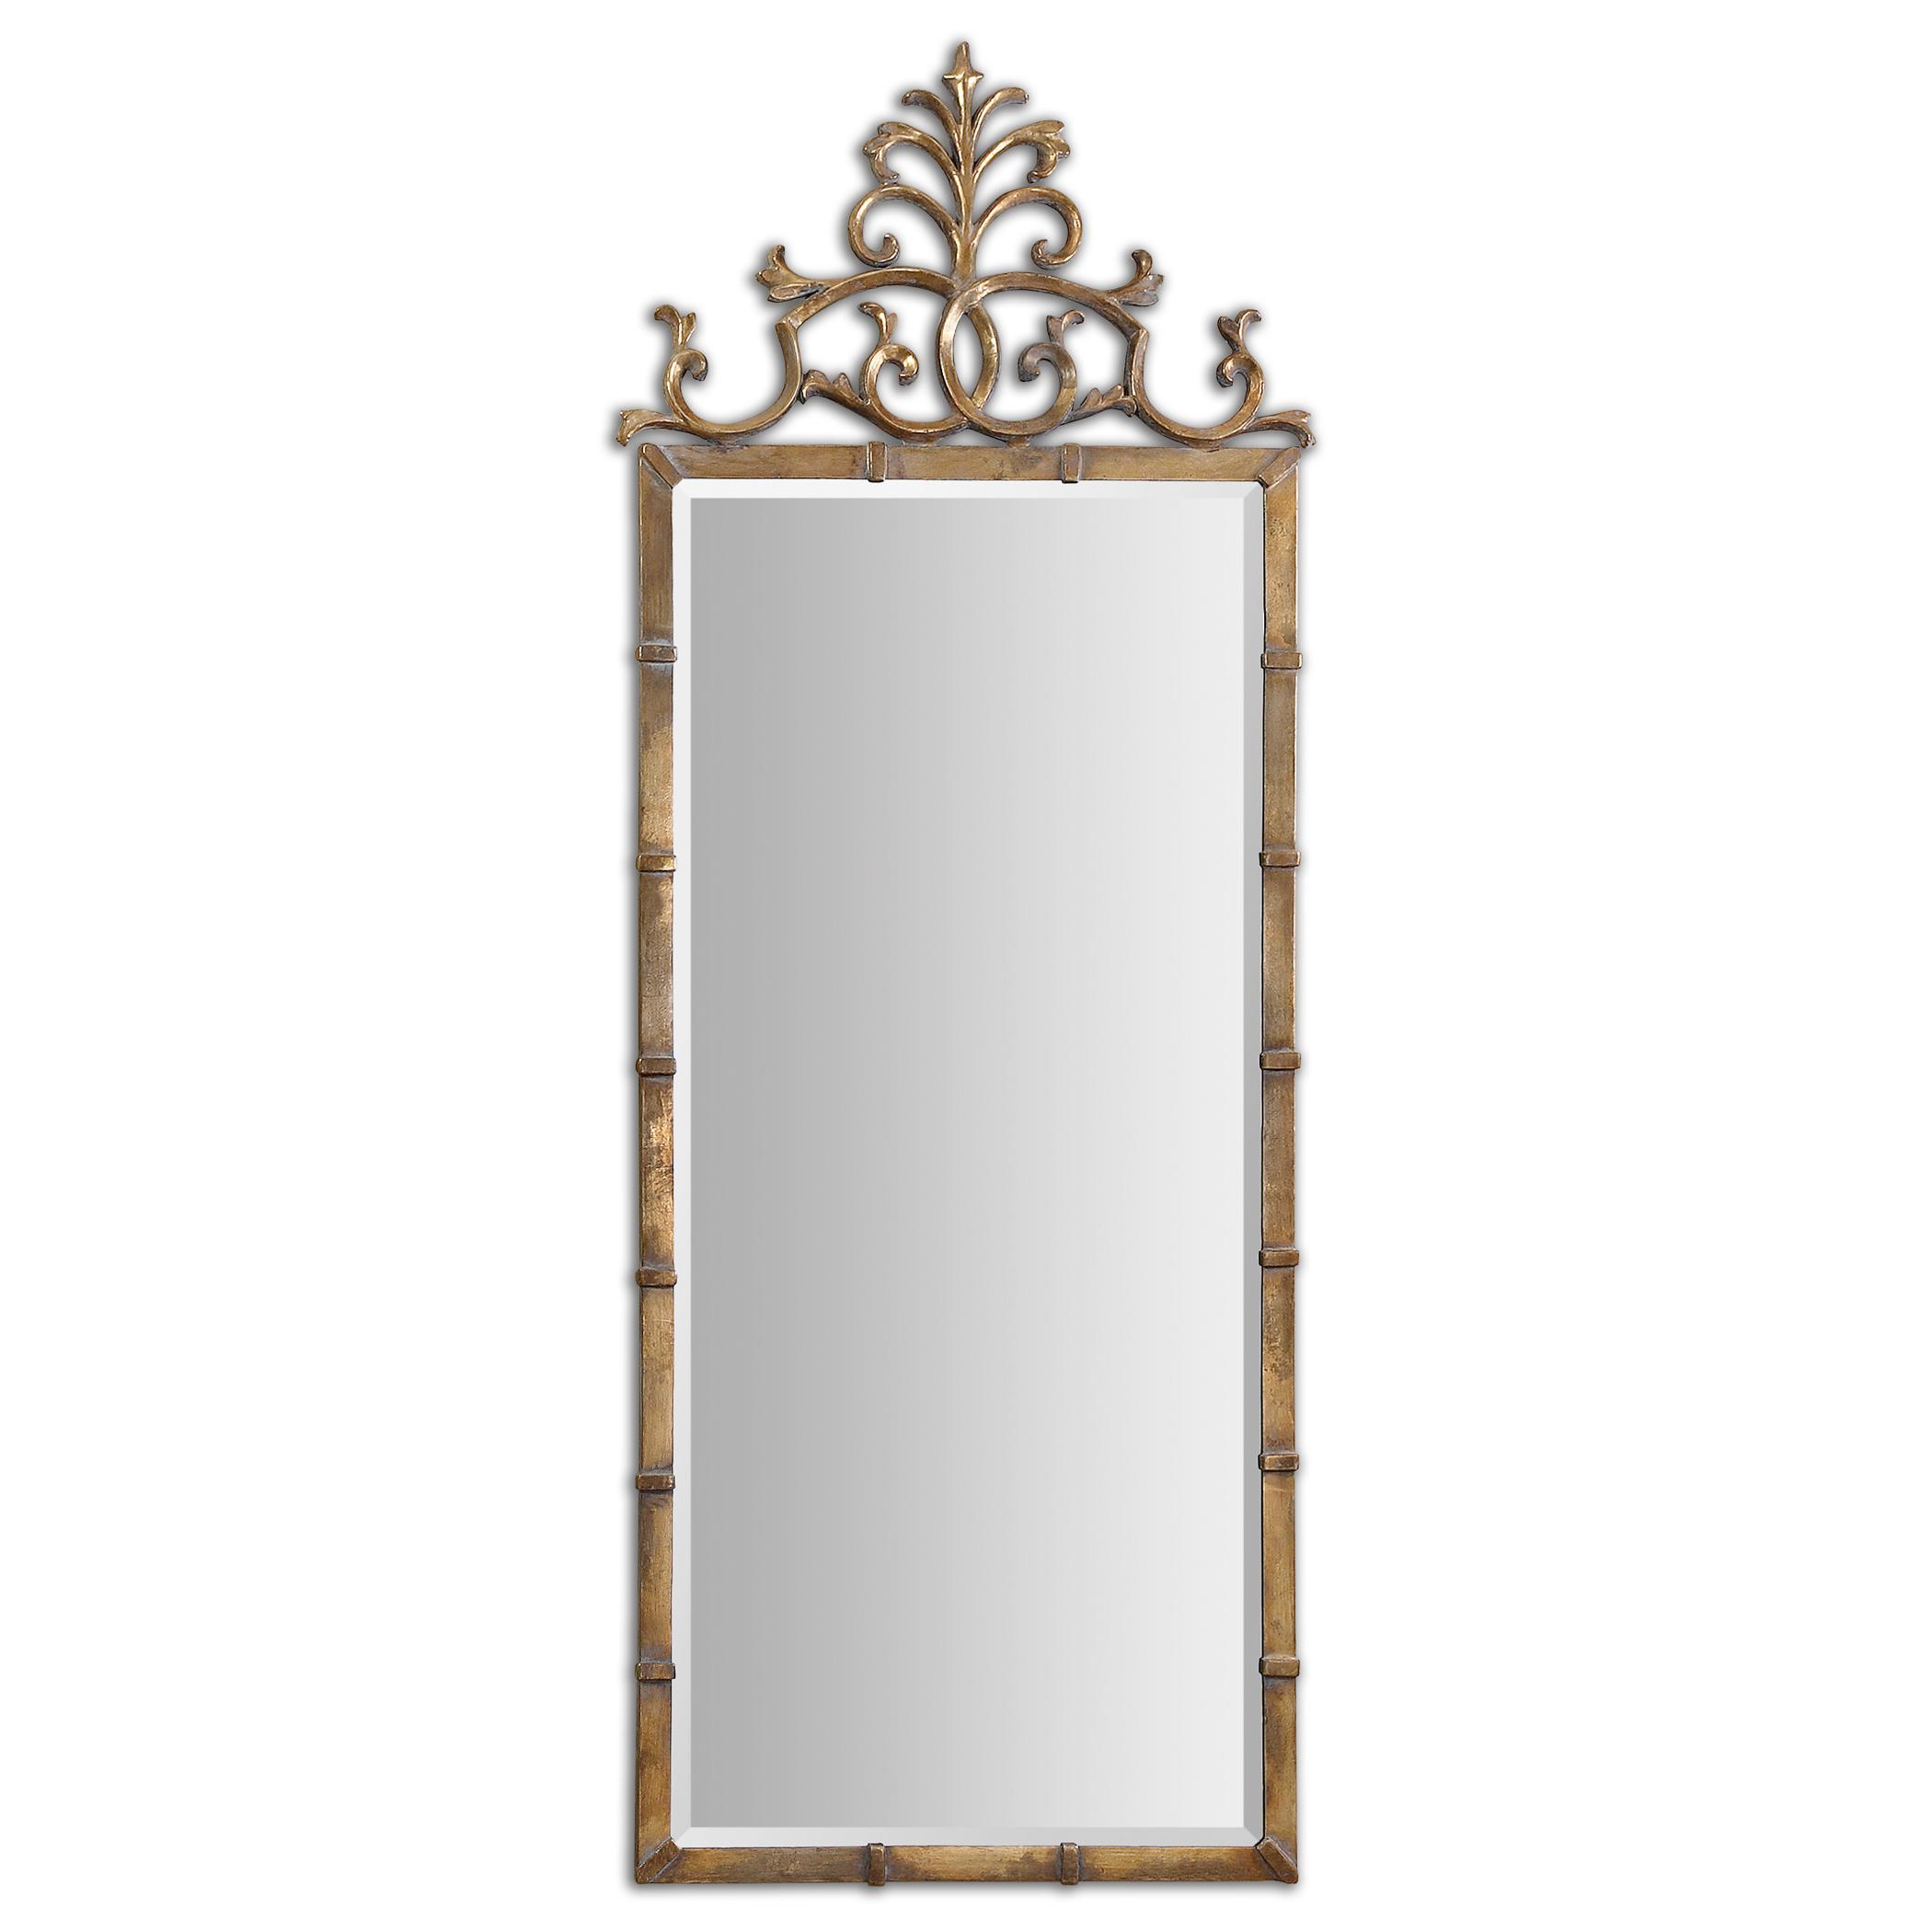 Uttermost Mirrors Vittoria Gold Metal Mirror - Item Number: 12884